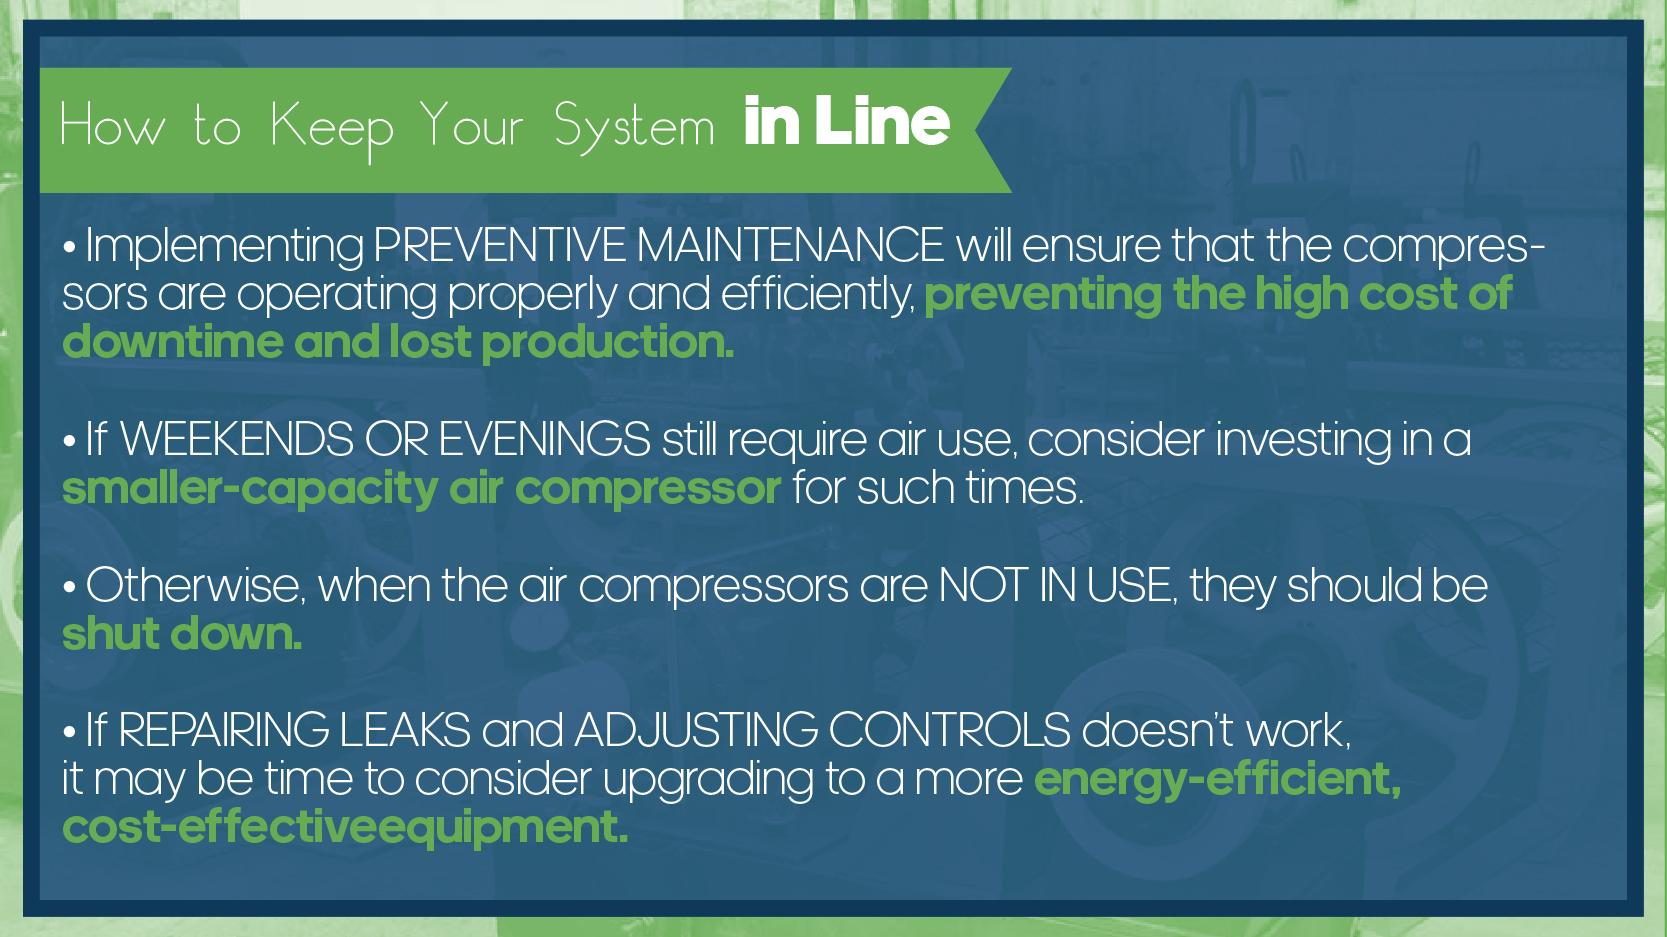 Air Compressor Efficiency Benefits Of Compressors Natural Gas Wiring Diagram Benefitsefficientaircompressors Premium 05